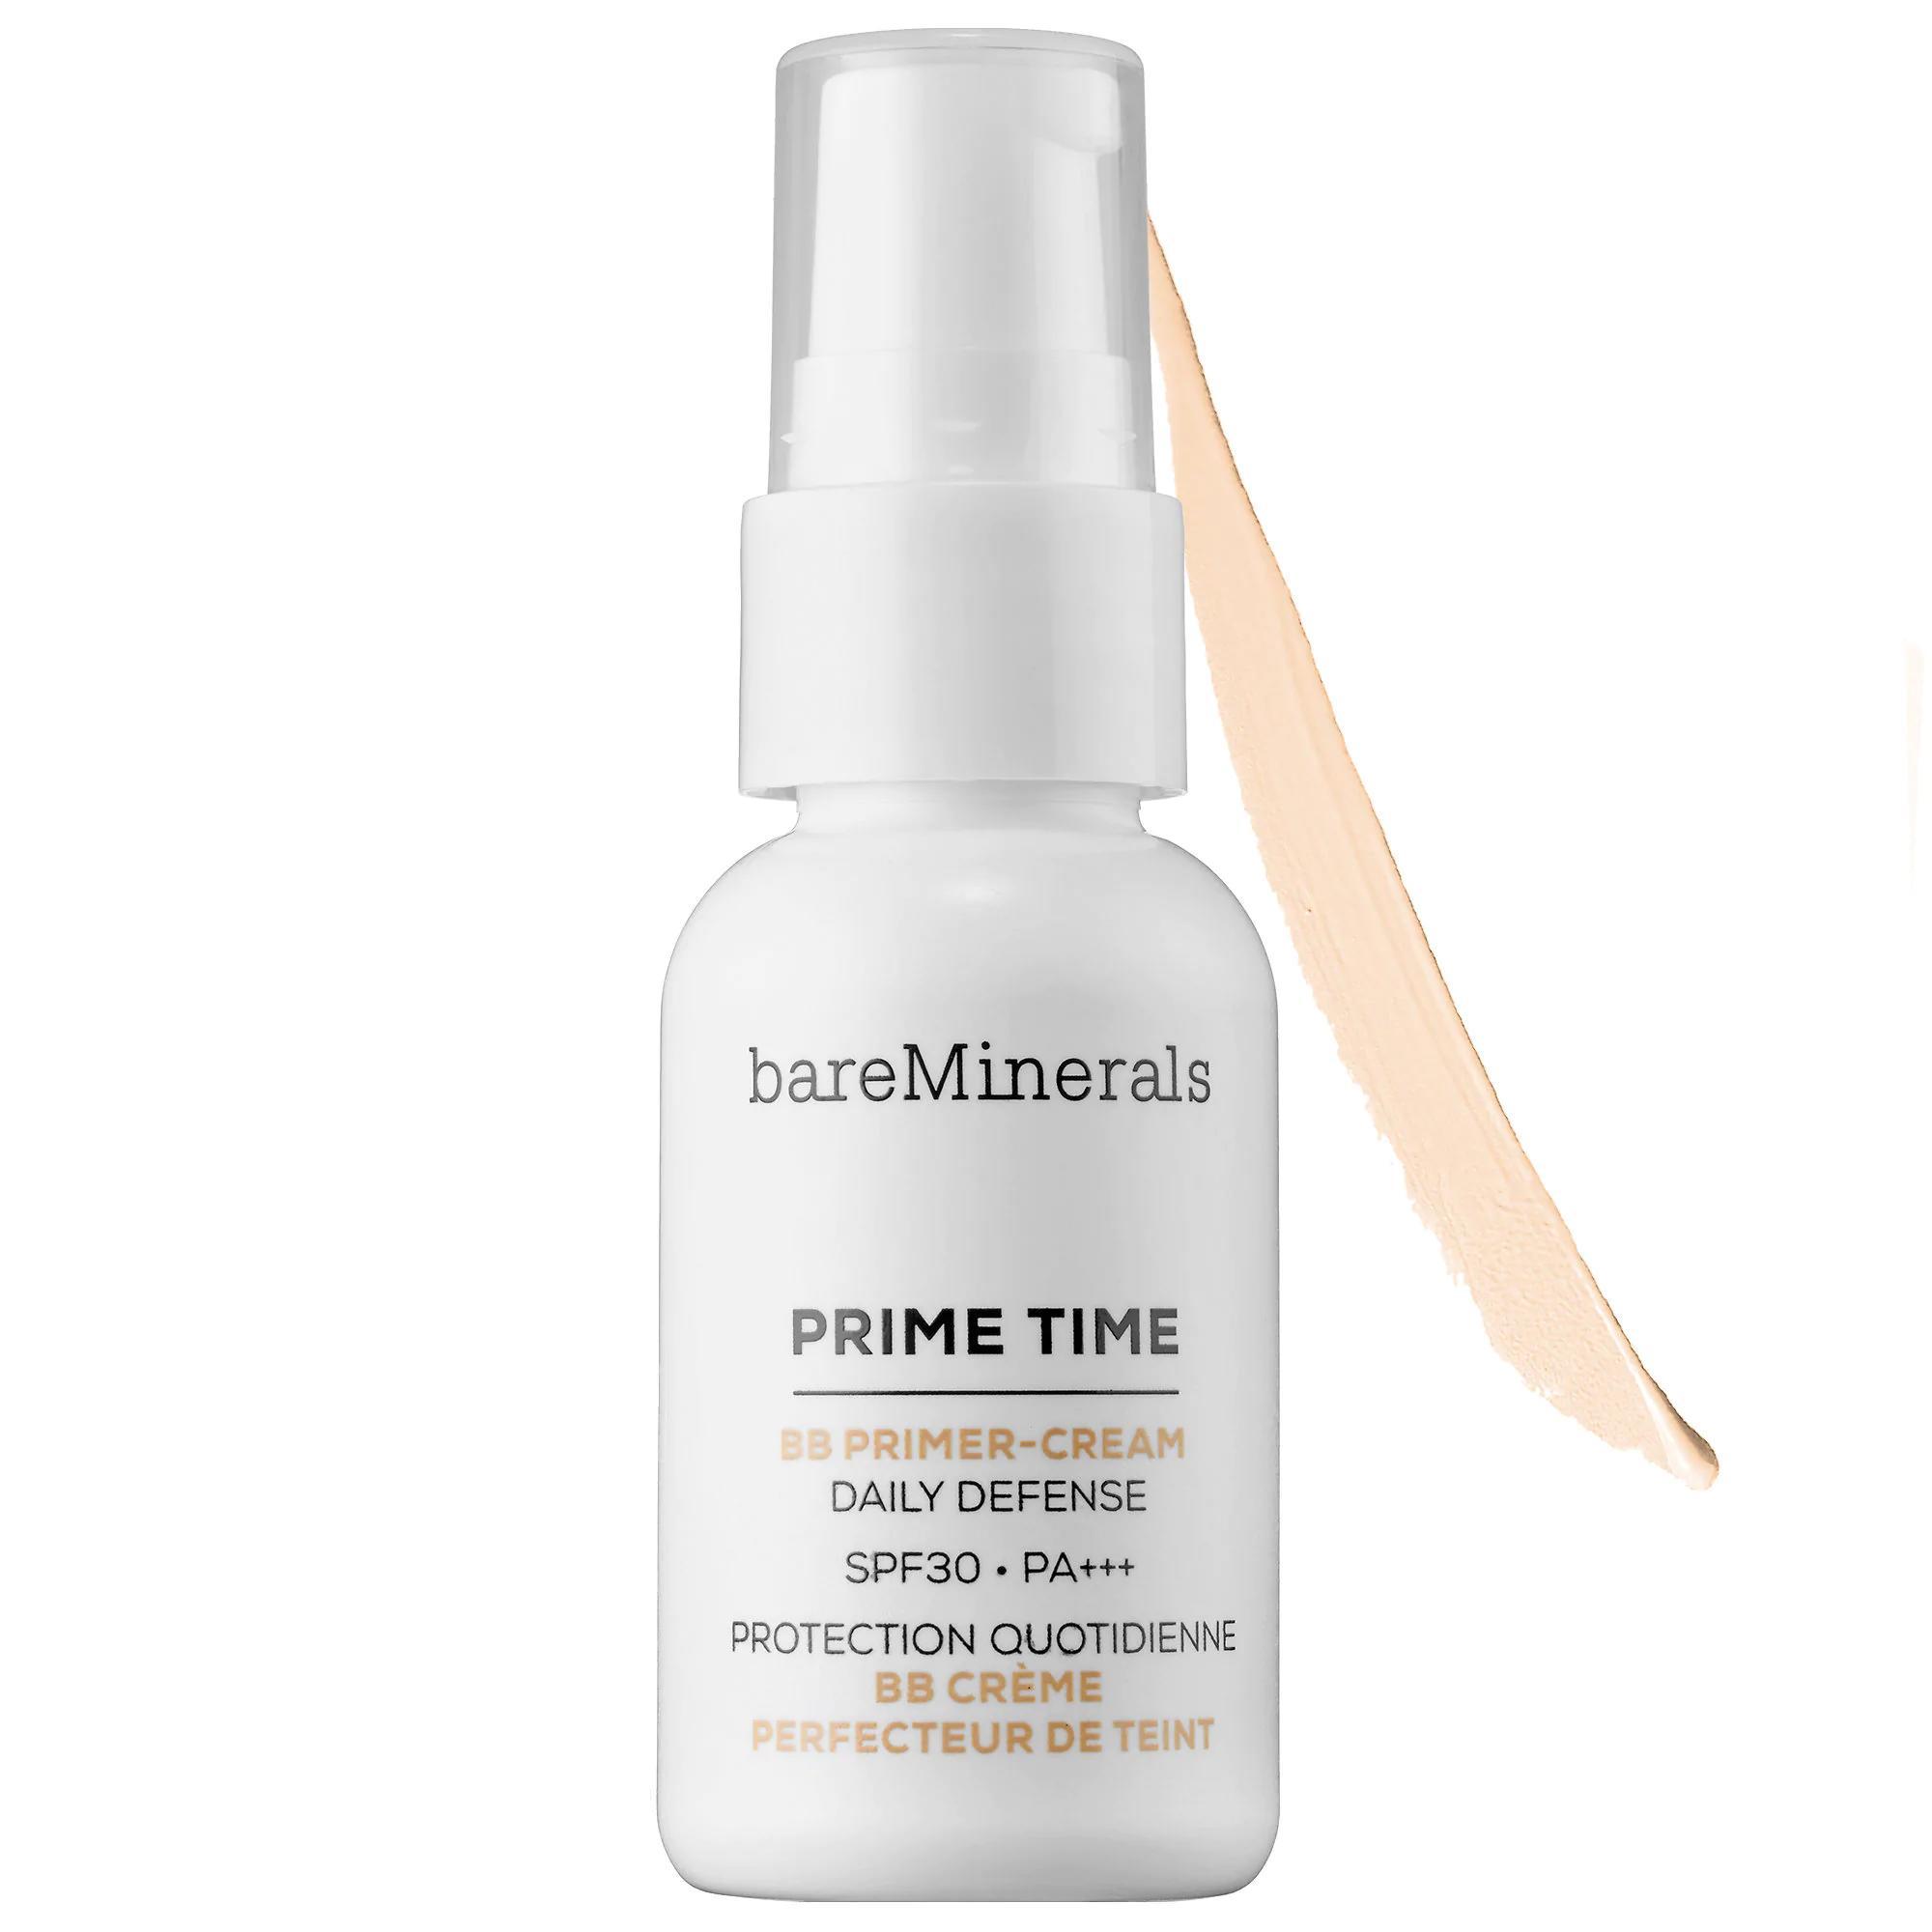 bareMinerals Prime Time BB Primer-Cream Fair